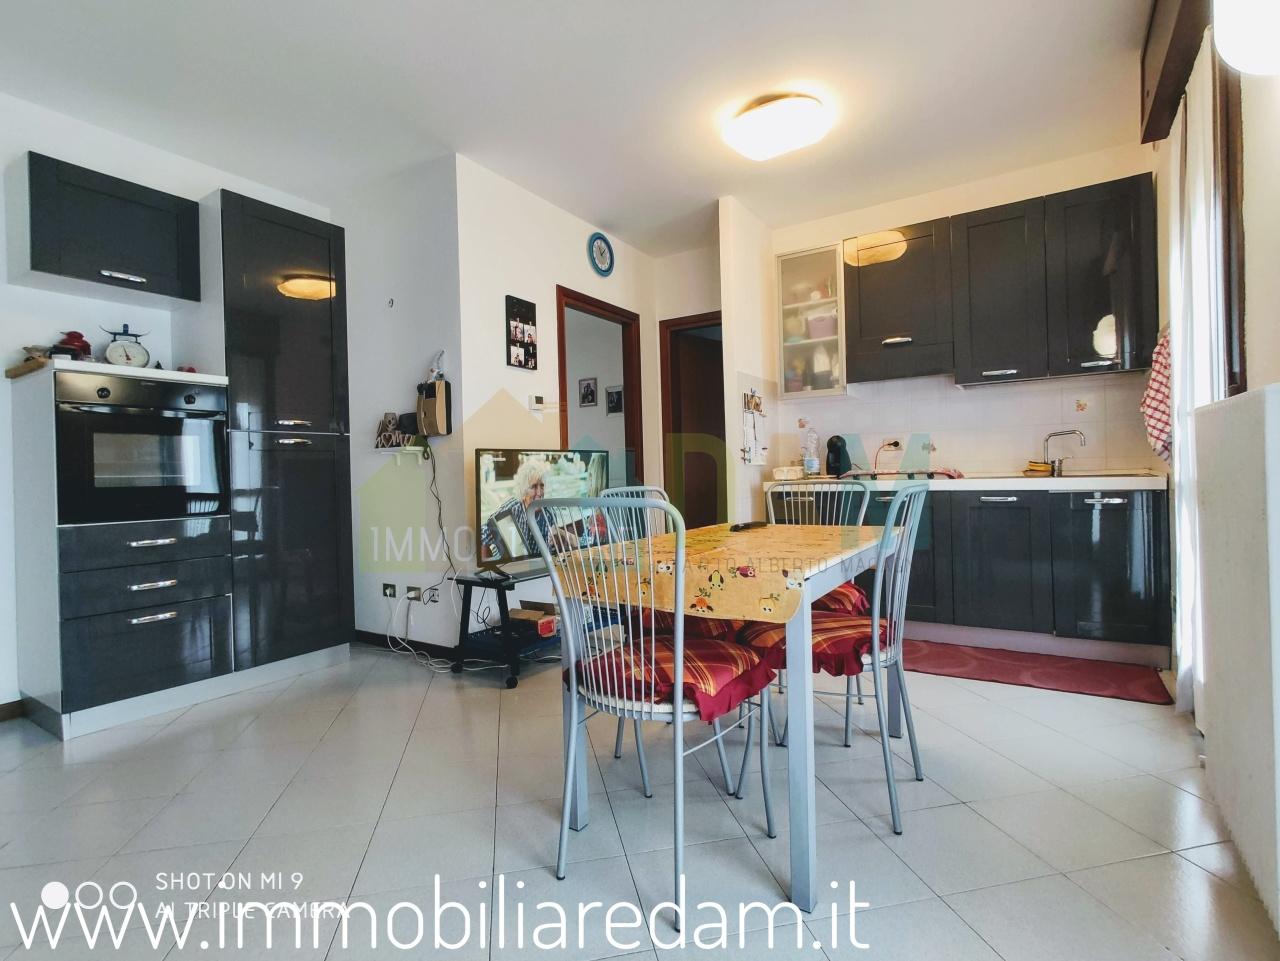 Appartamento - Miniappartamento a ospedale, Vicenza